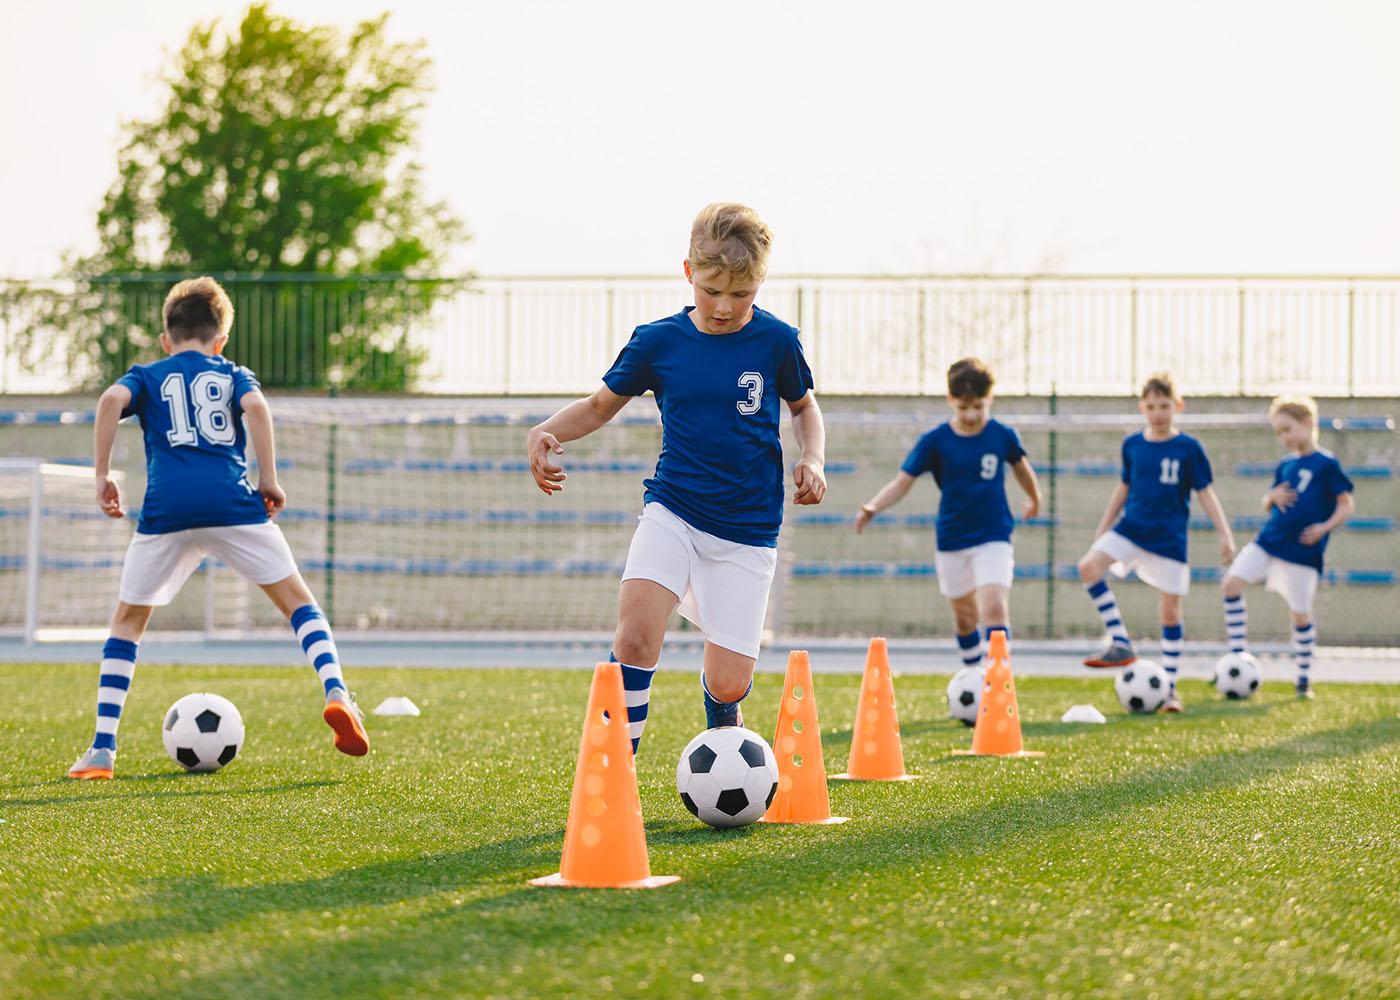 rapazes jogar futebol